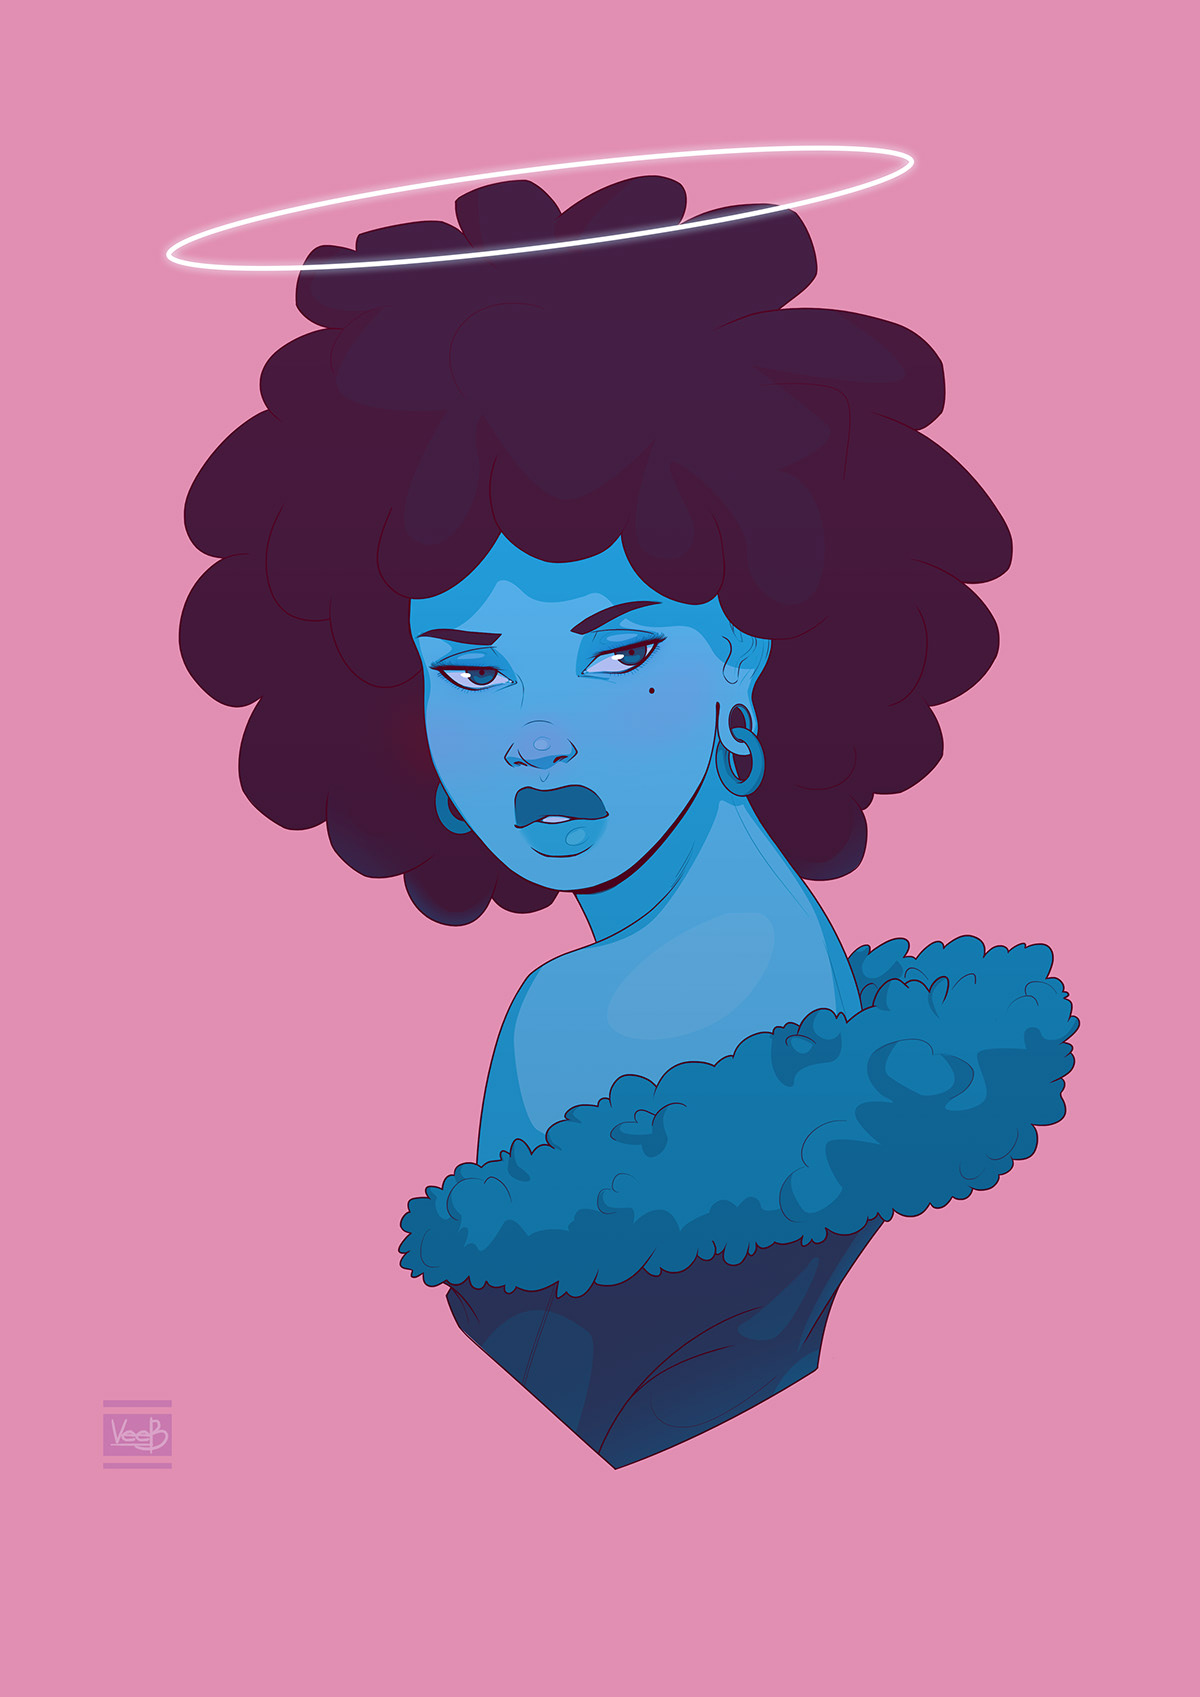 Drawing  graphic design  afropunk Pop Art afro Dreadlocks Digital Art  ILLUSTRATION  colorful vibrant